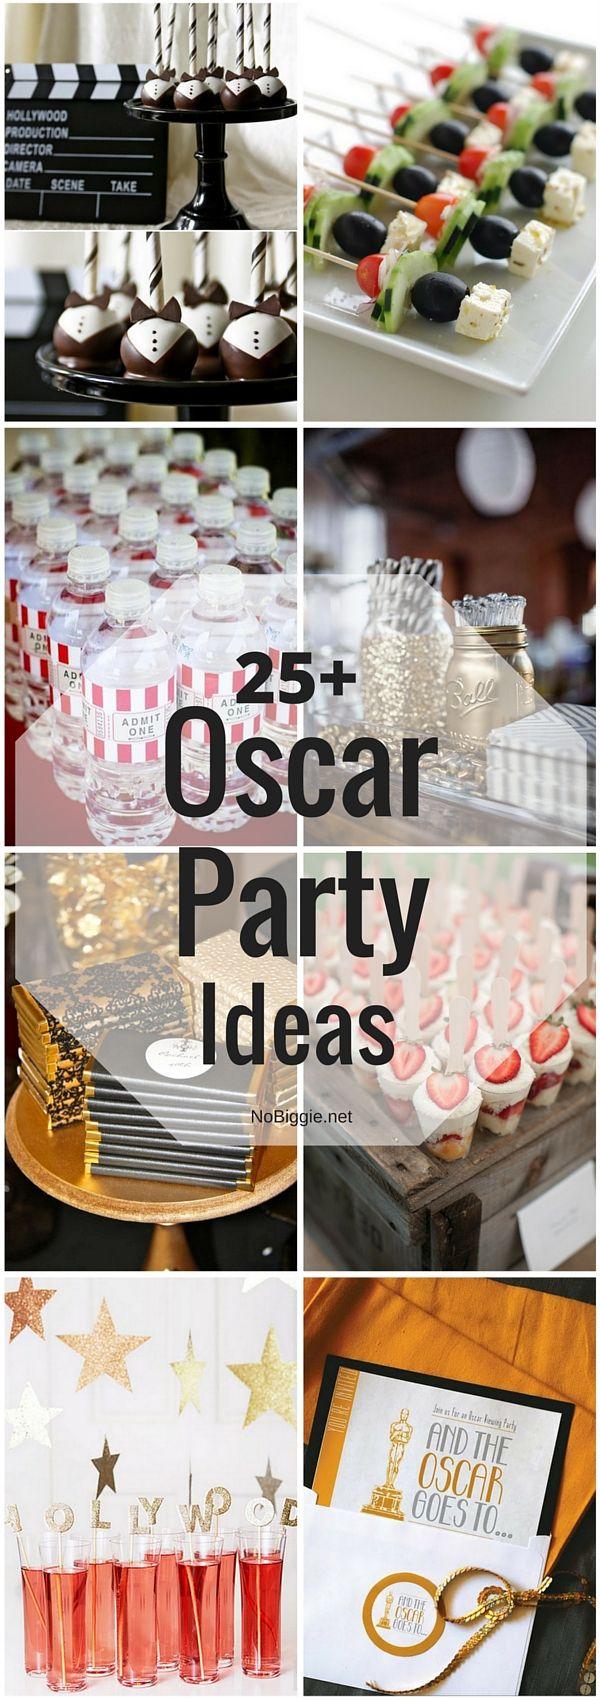 25+ Oscar Party Ideas | NoBiggie.net